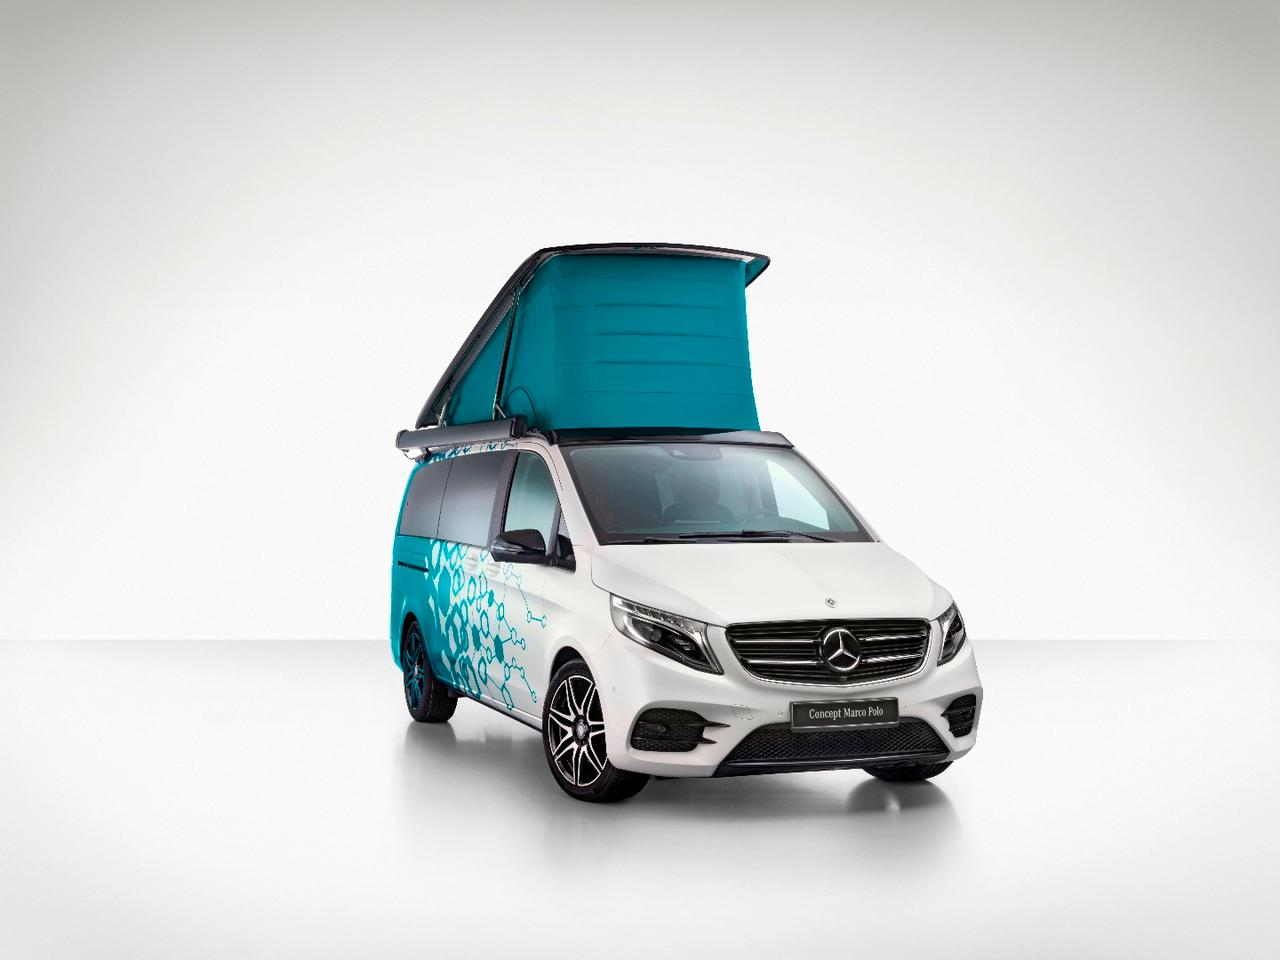 The Concept Marco Polo exploresmore integrated camper van control